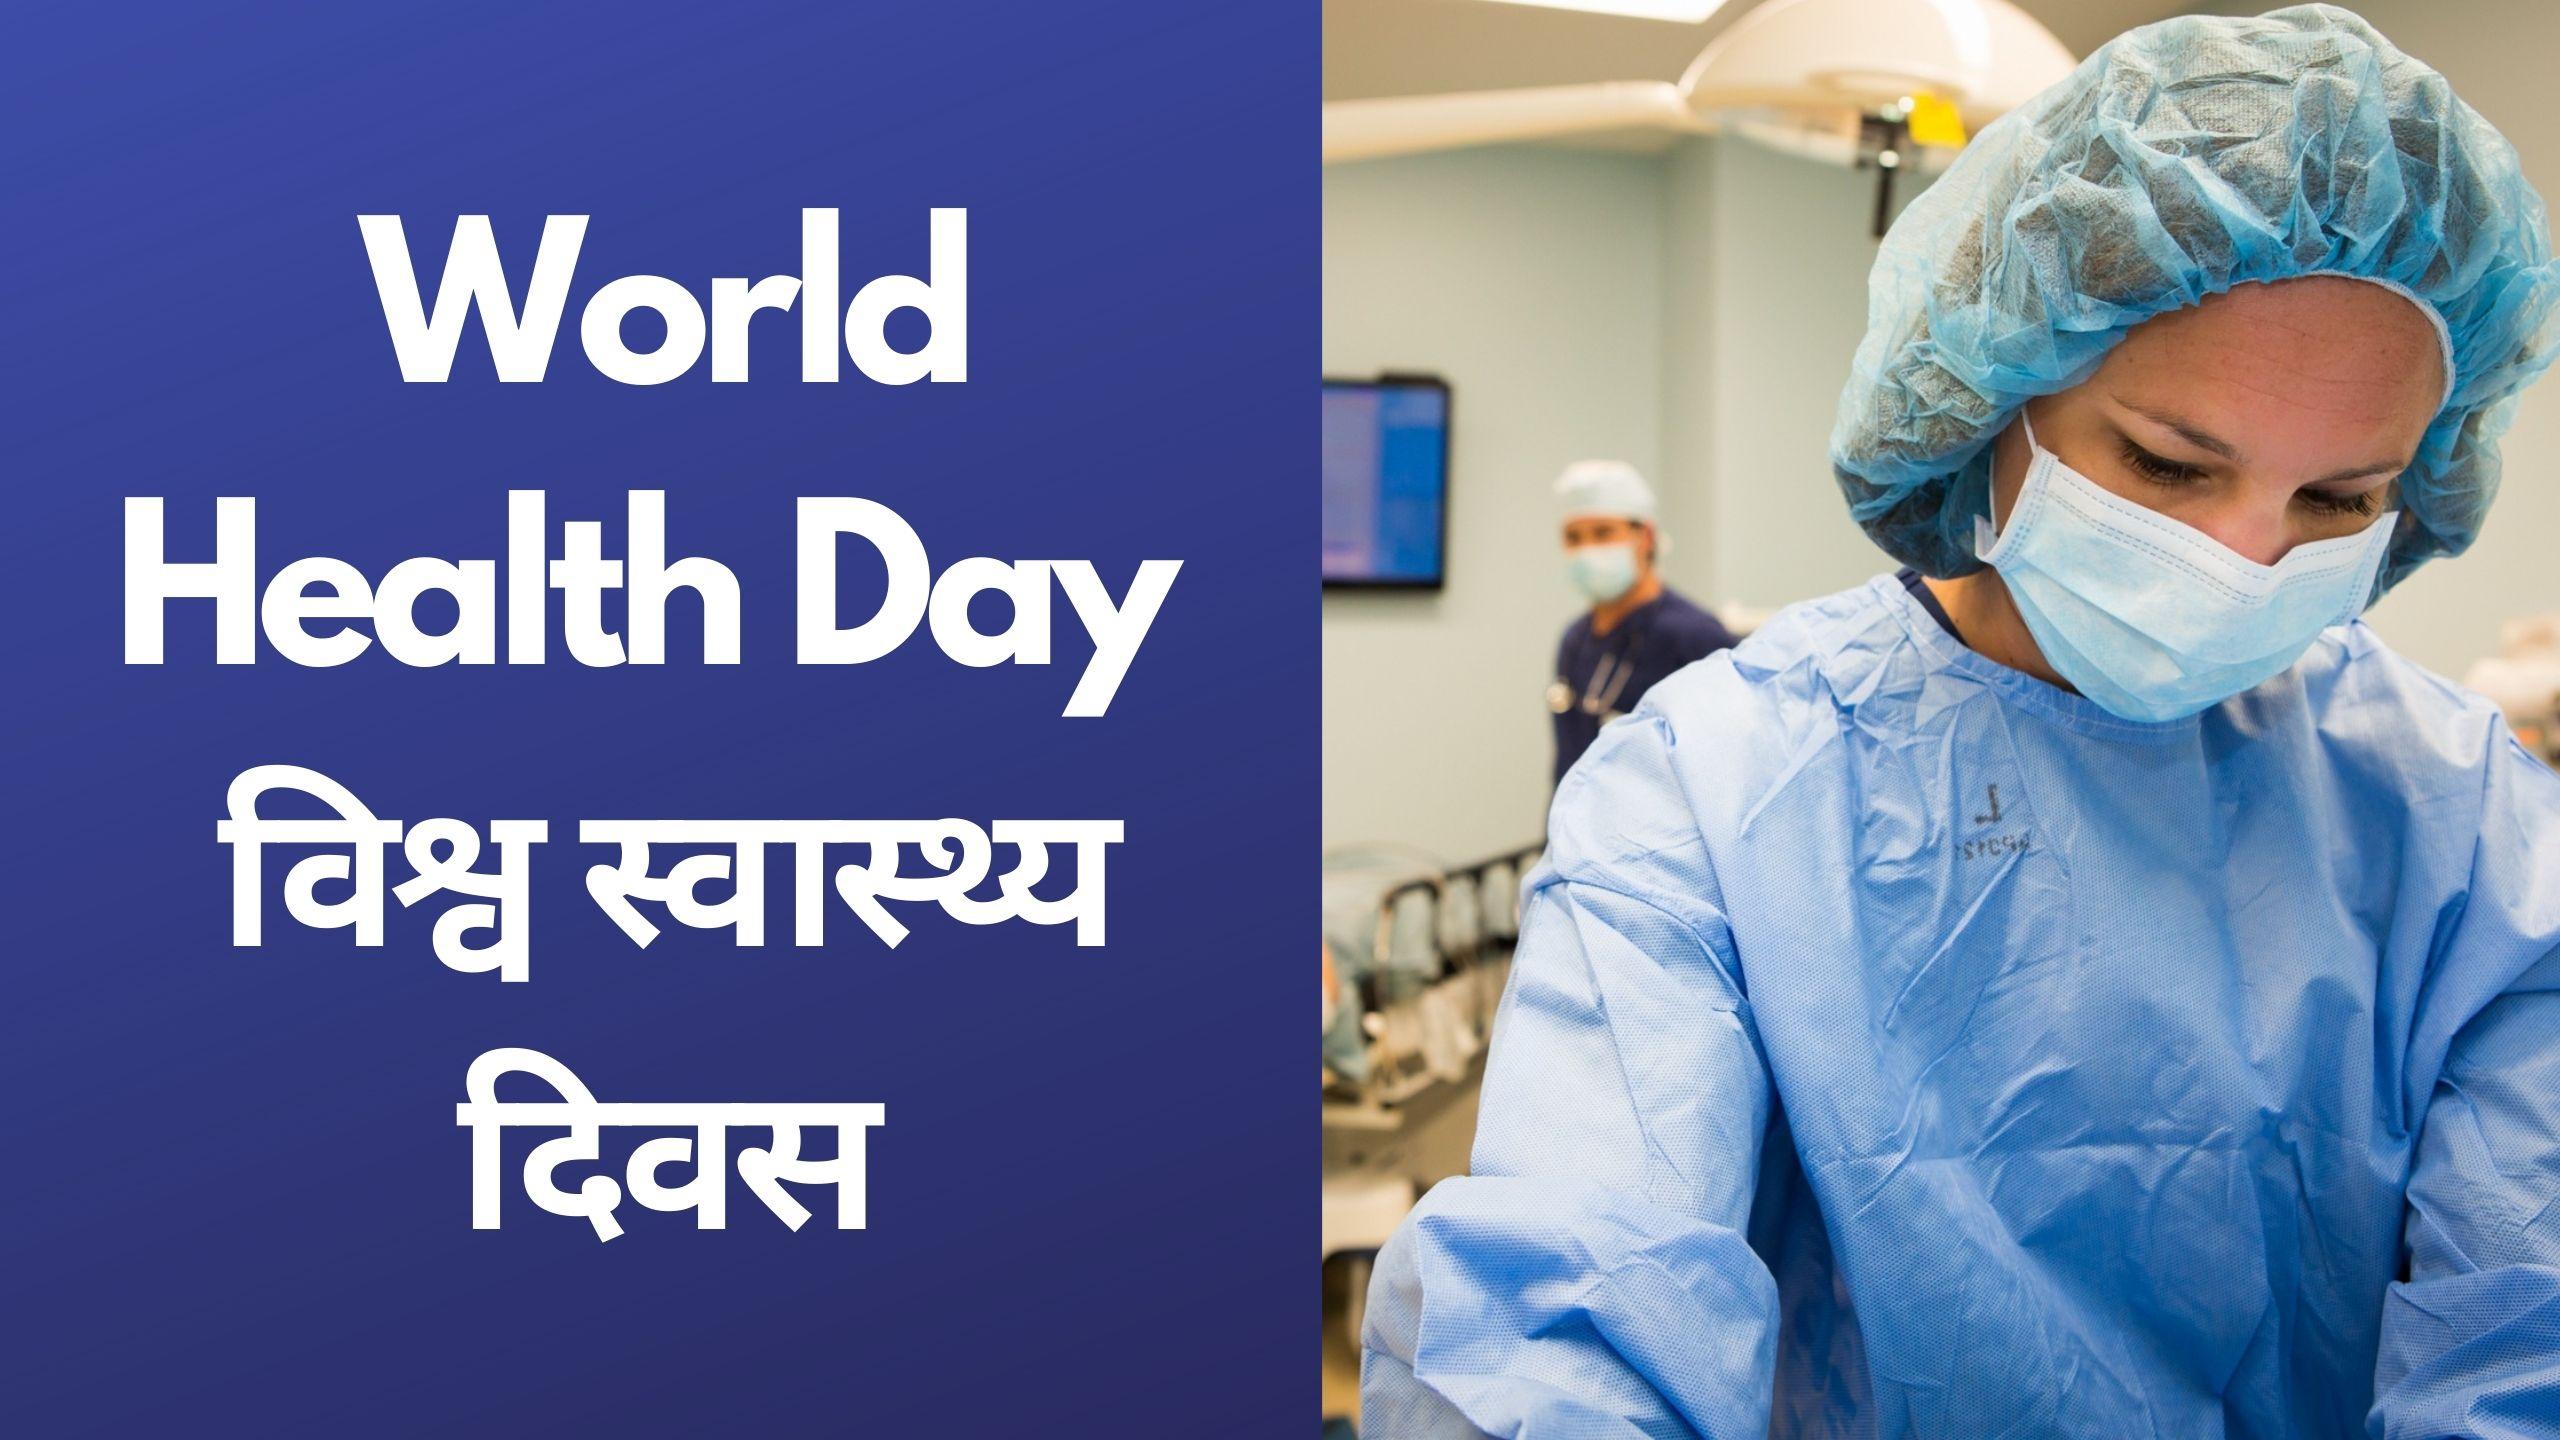 World Health Day विश्व स्वास्थ्य दिवस